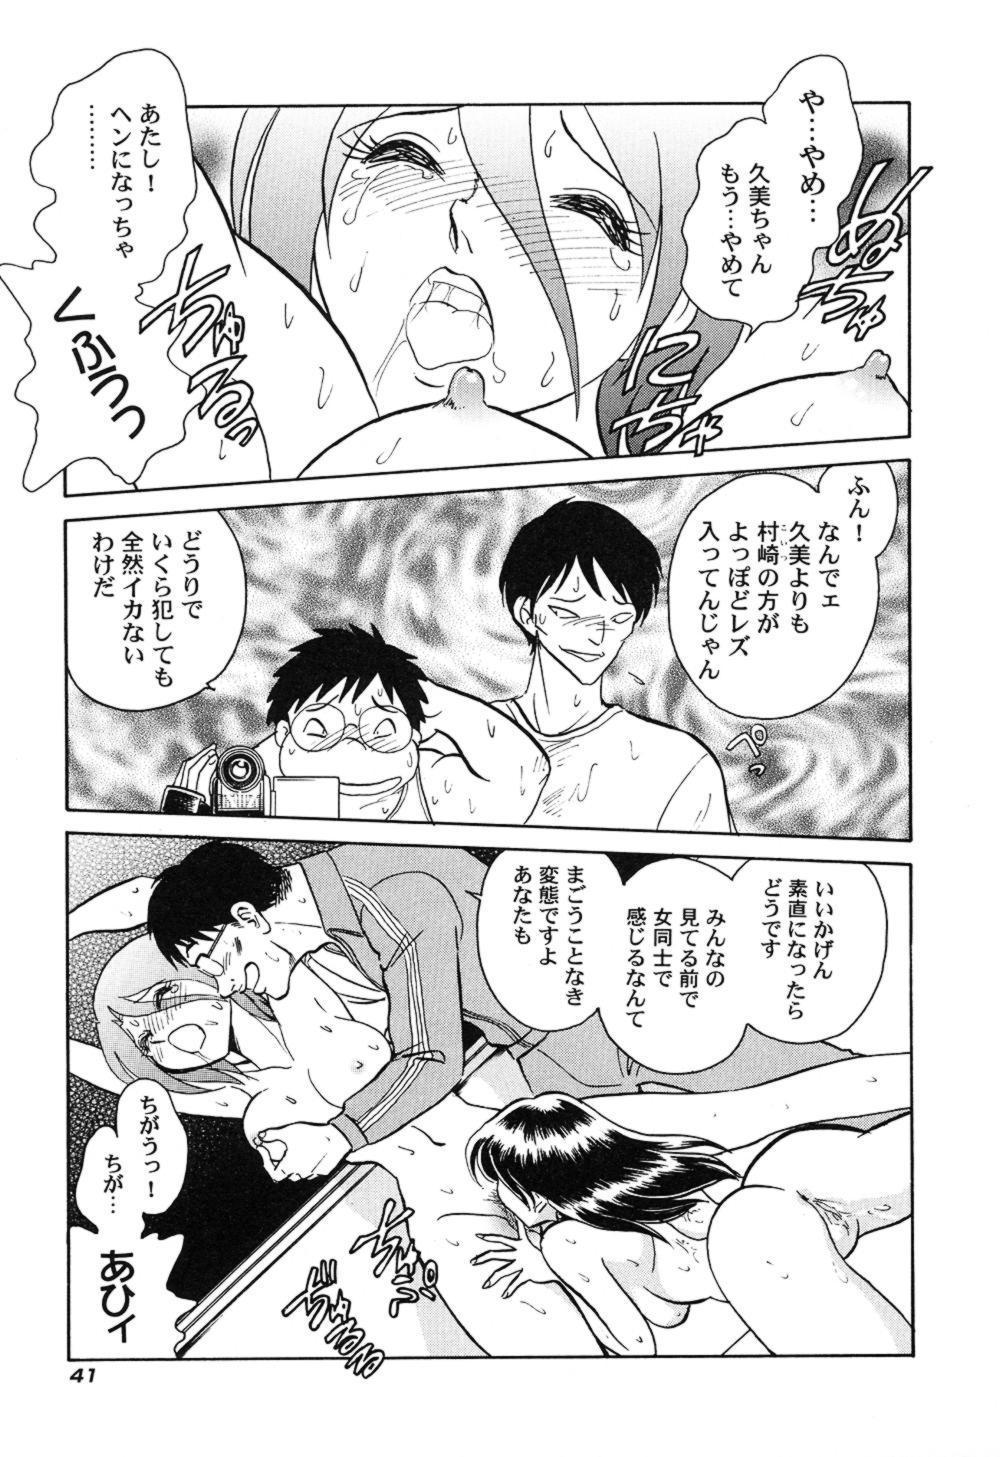 Hageshii Kagai Jugyou 43